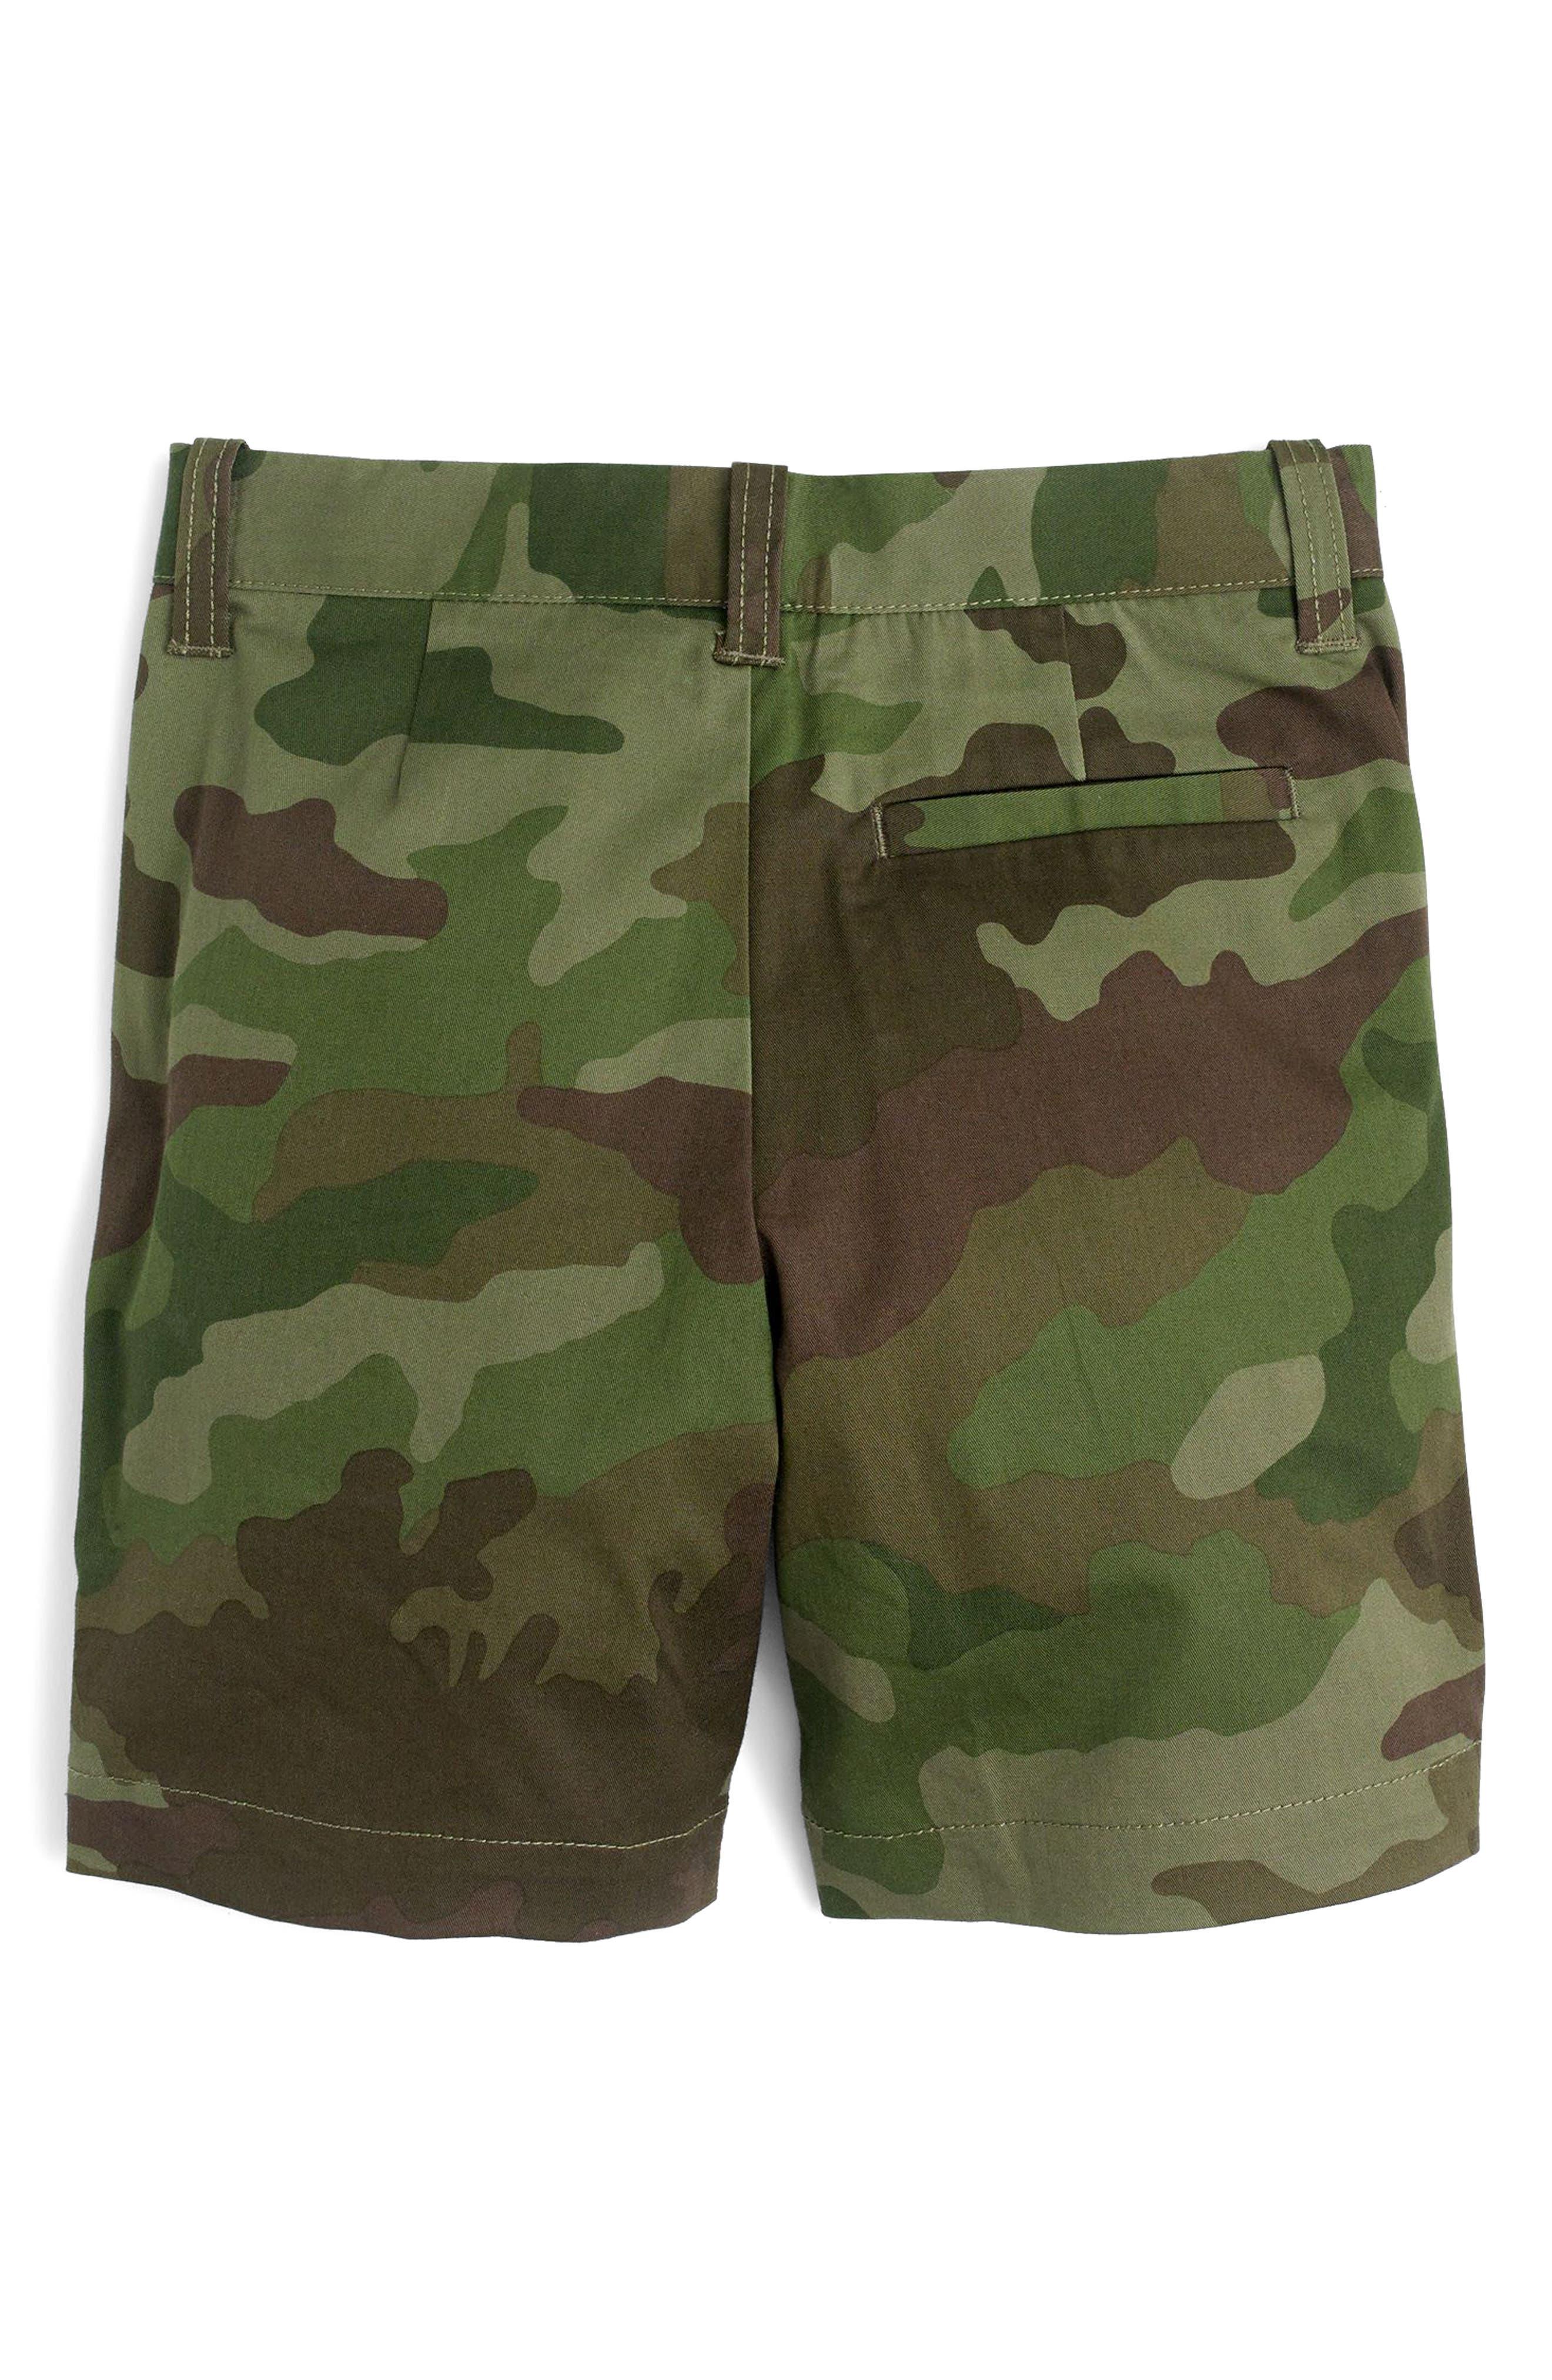 Stanton Camo Shorts,                             Alternate thumbnail 2, color,                             Camo Multi